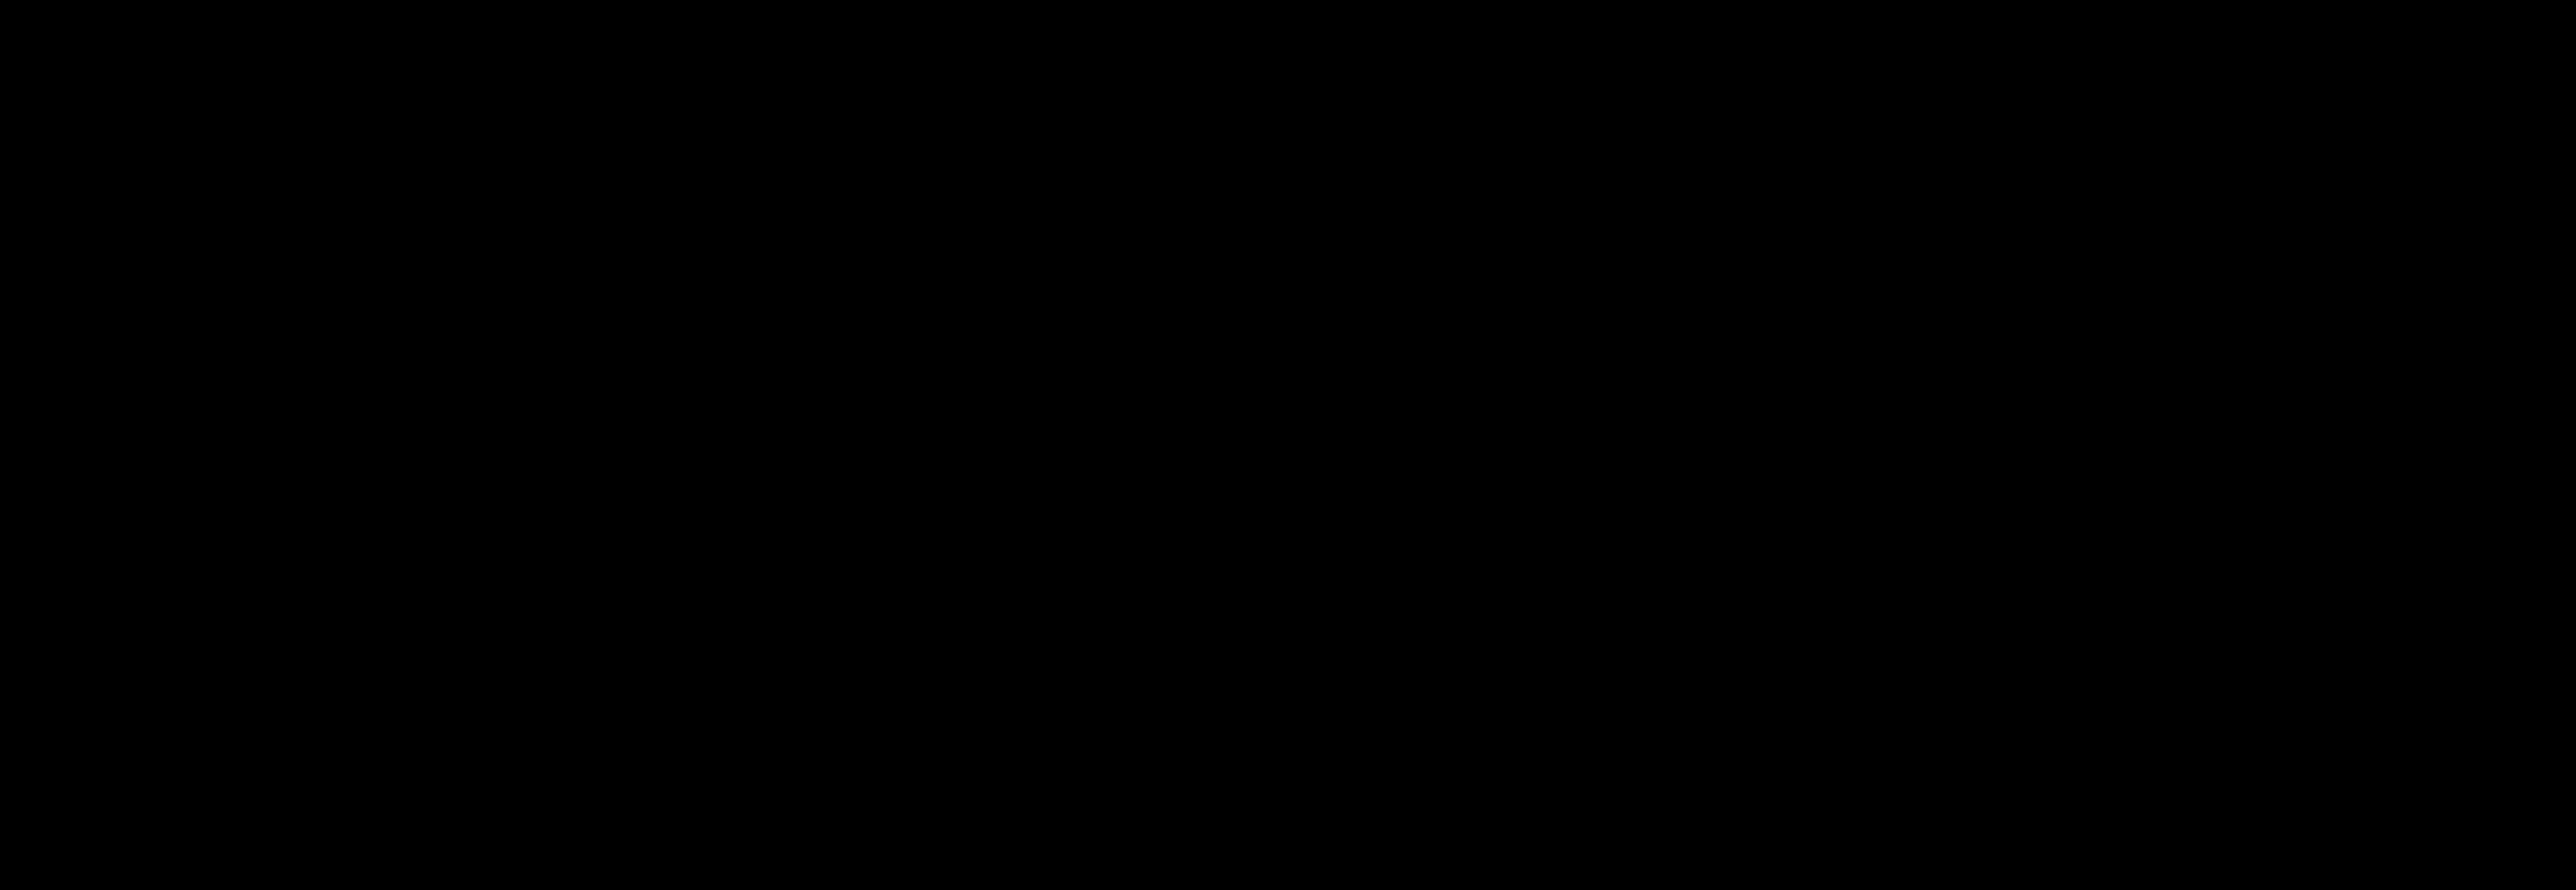 Curcumin-diclofenac conjugate